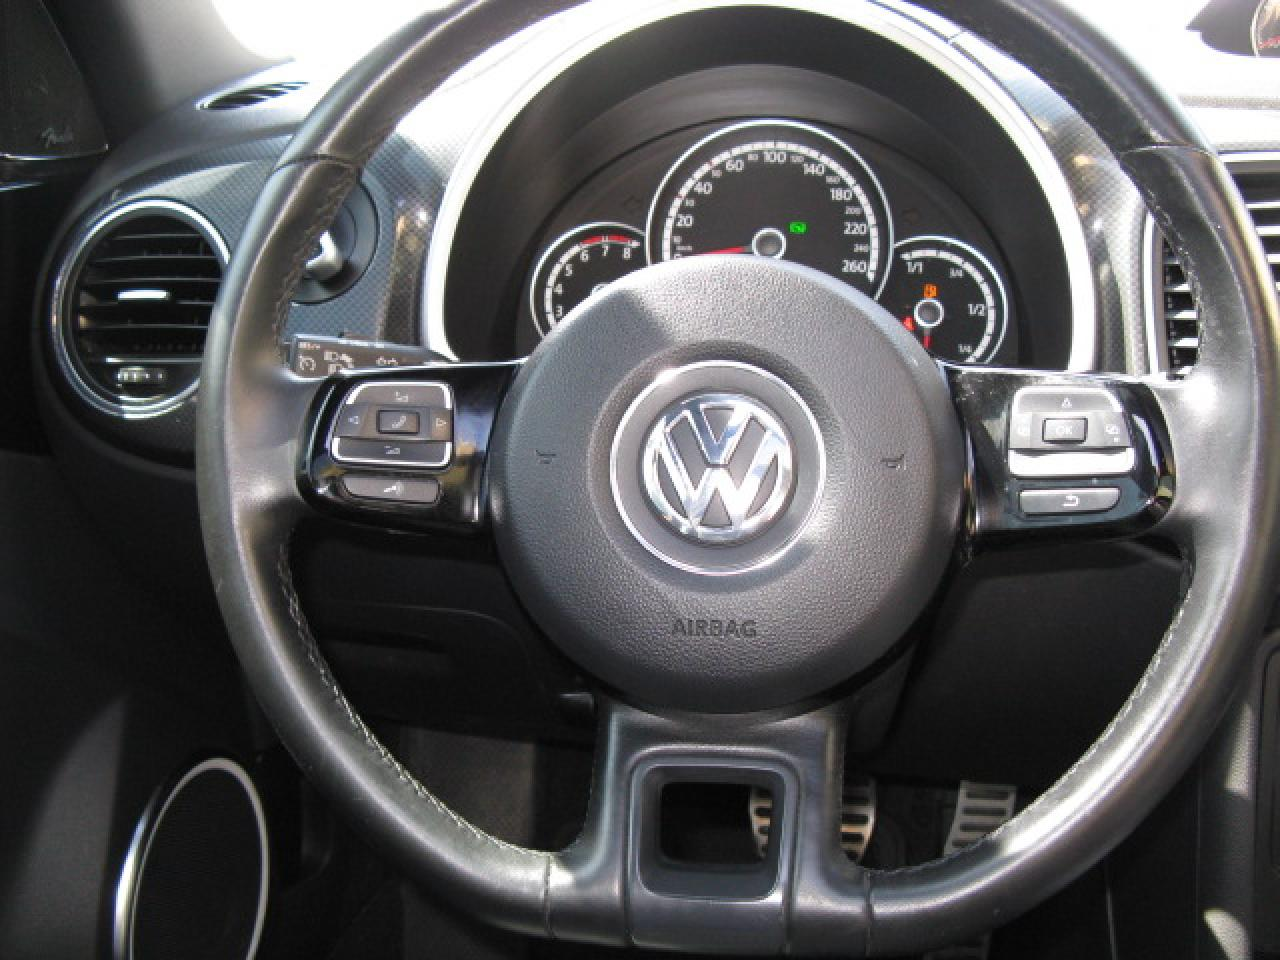 2013 Volkswagen Beetle 2.0T Turbo NAVIGATION LEATHER SUNROOF